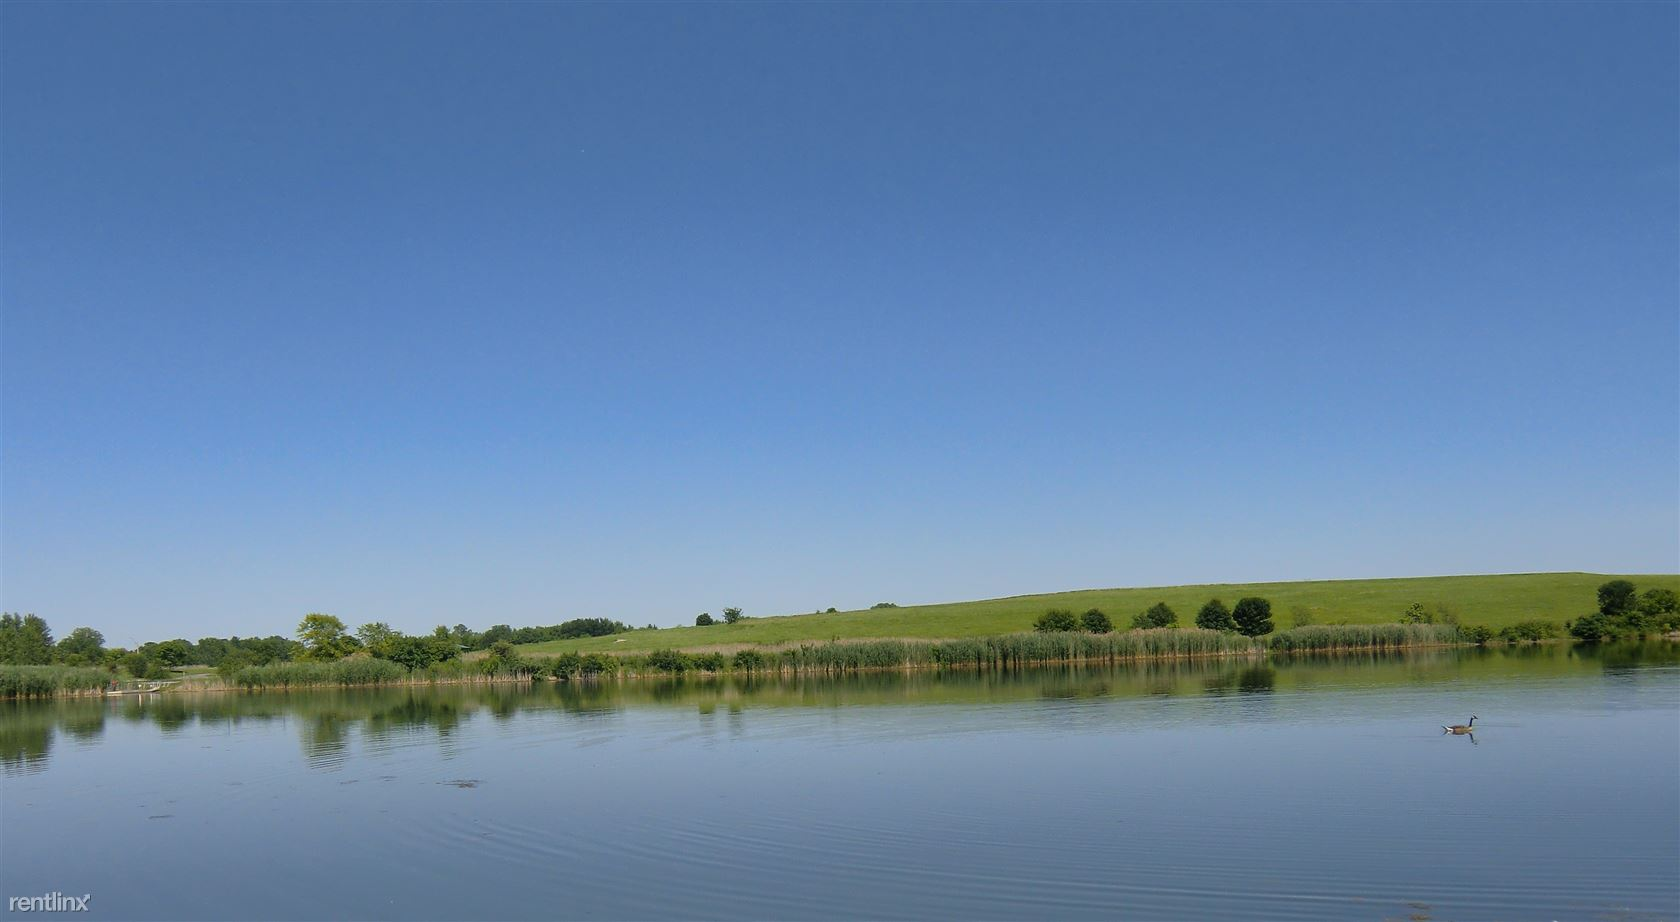 LSE pond 1